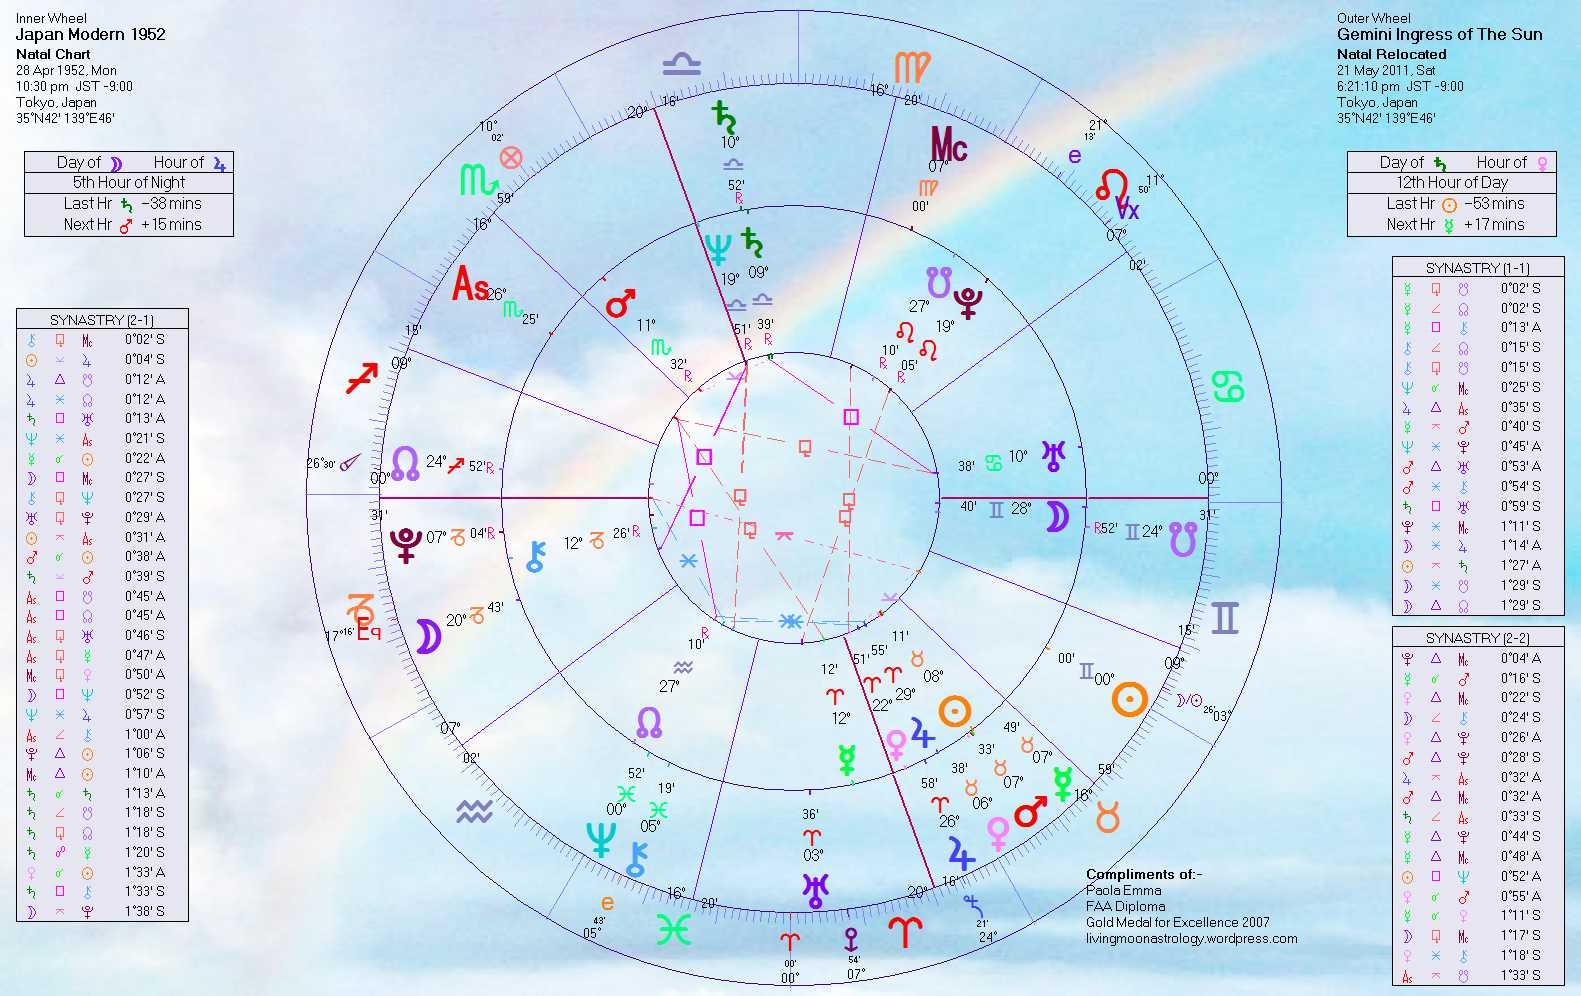 2011 sun ingress in gemini modern japans birth chart home of hot spots around the world horoscopes for the ingress of the sun in gemini may 21 2011 2011 sun ingress in gemini modern japans birth chart nvjuhfo Gallery